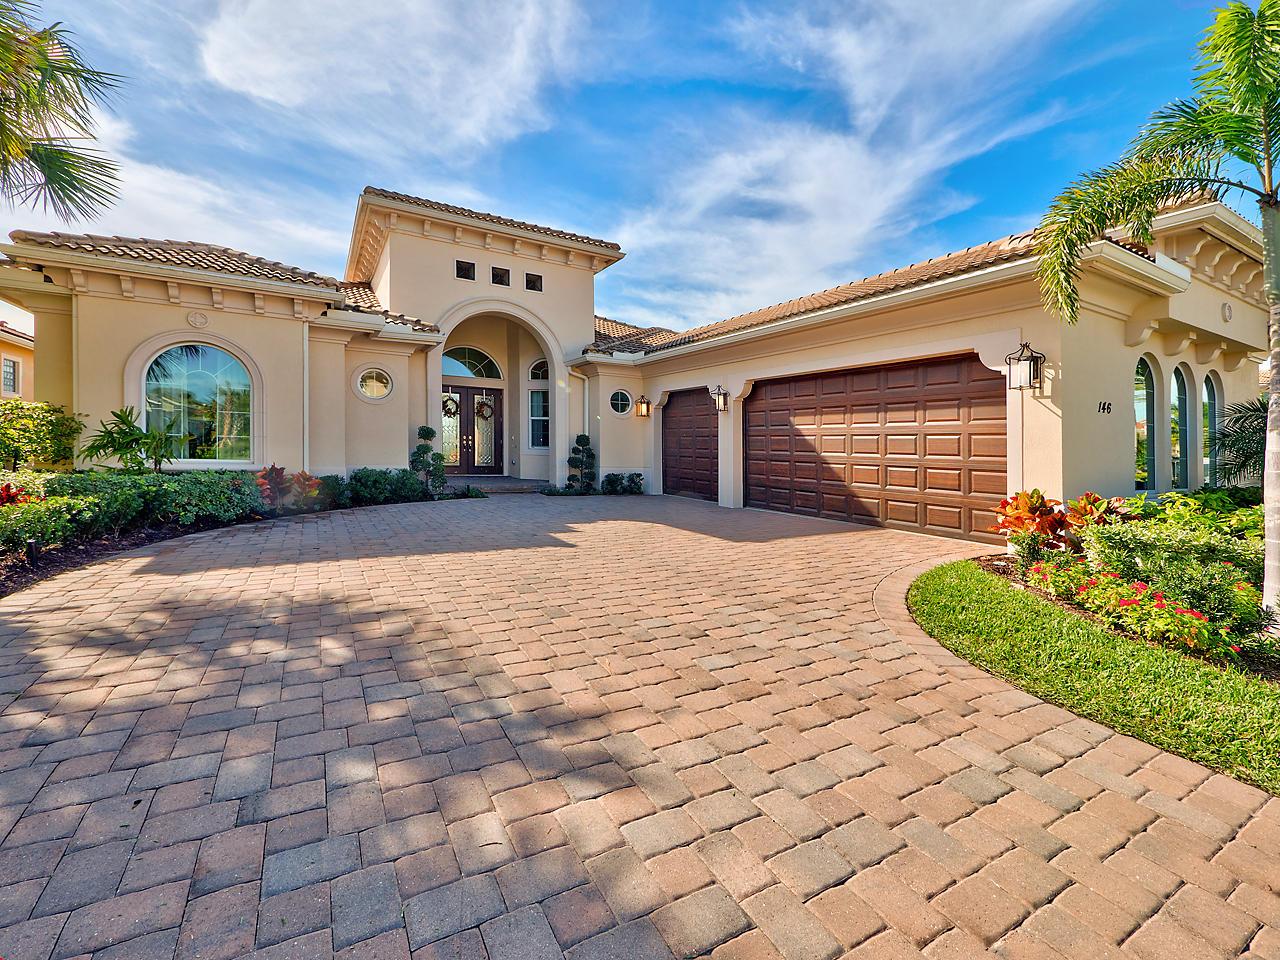 146 Carmela, Jupiter, Florida 33478, 4 Bedrooms Bedrooms, ,3.1 BathroomsBathrooms,A,Single family,Carmela,RX-10430136